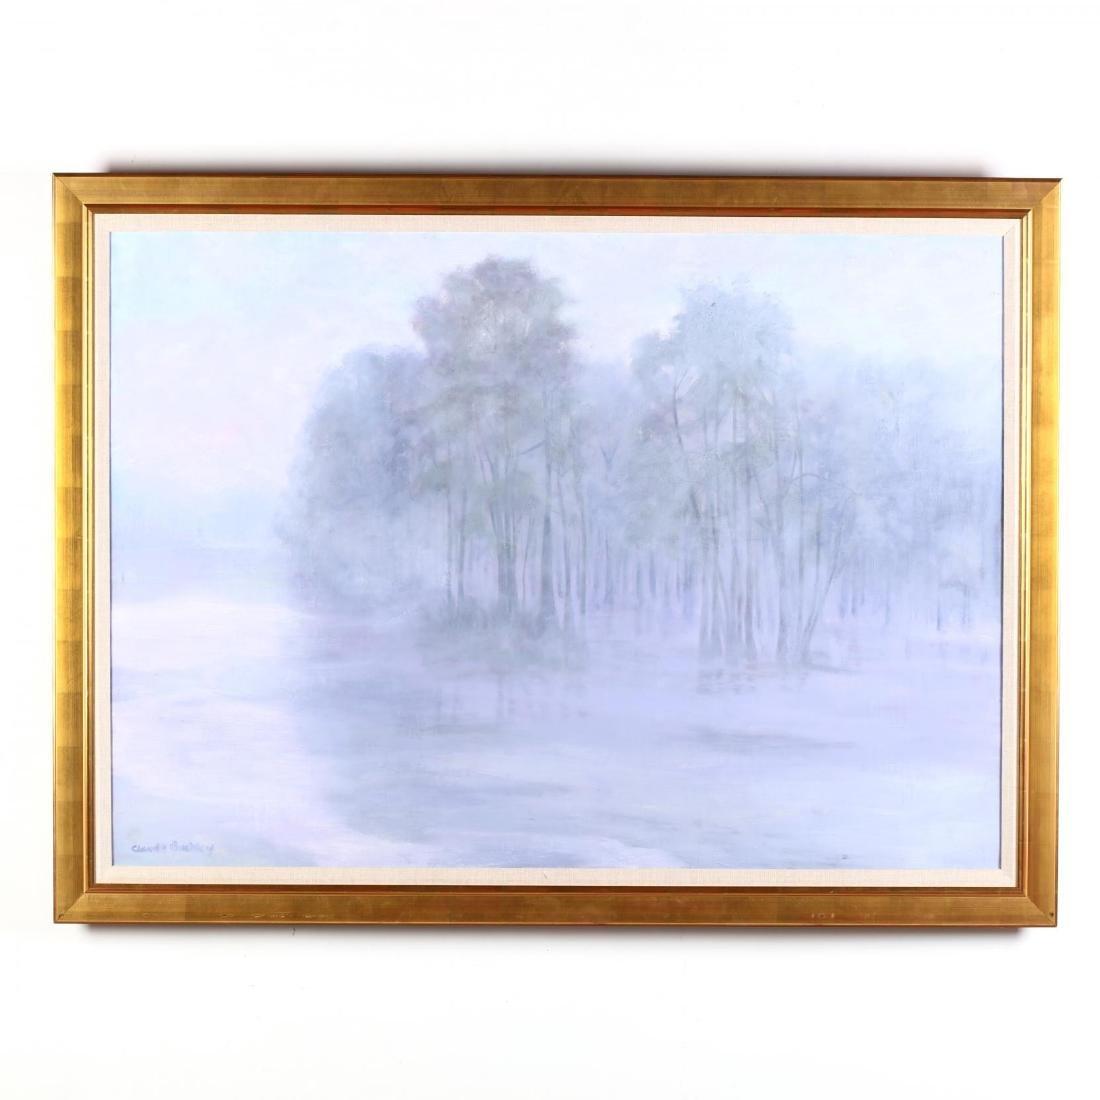 Claude Buckley (SC), Low Country Landscape